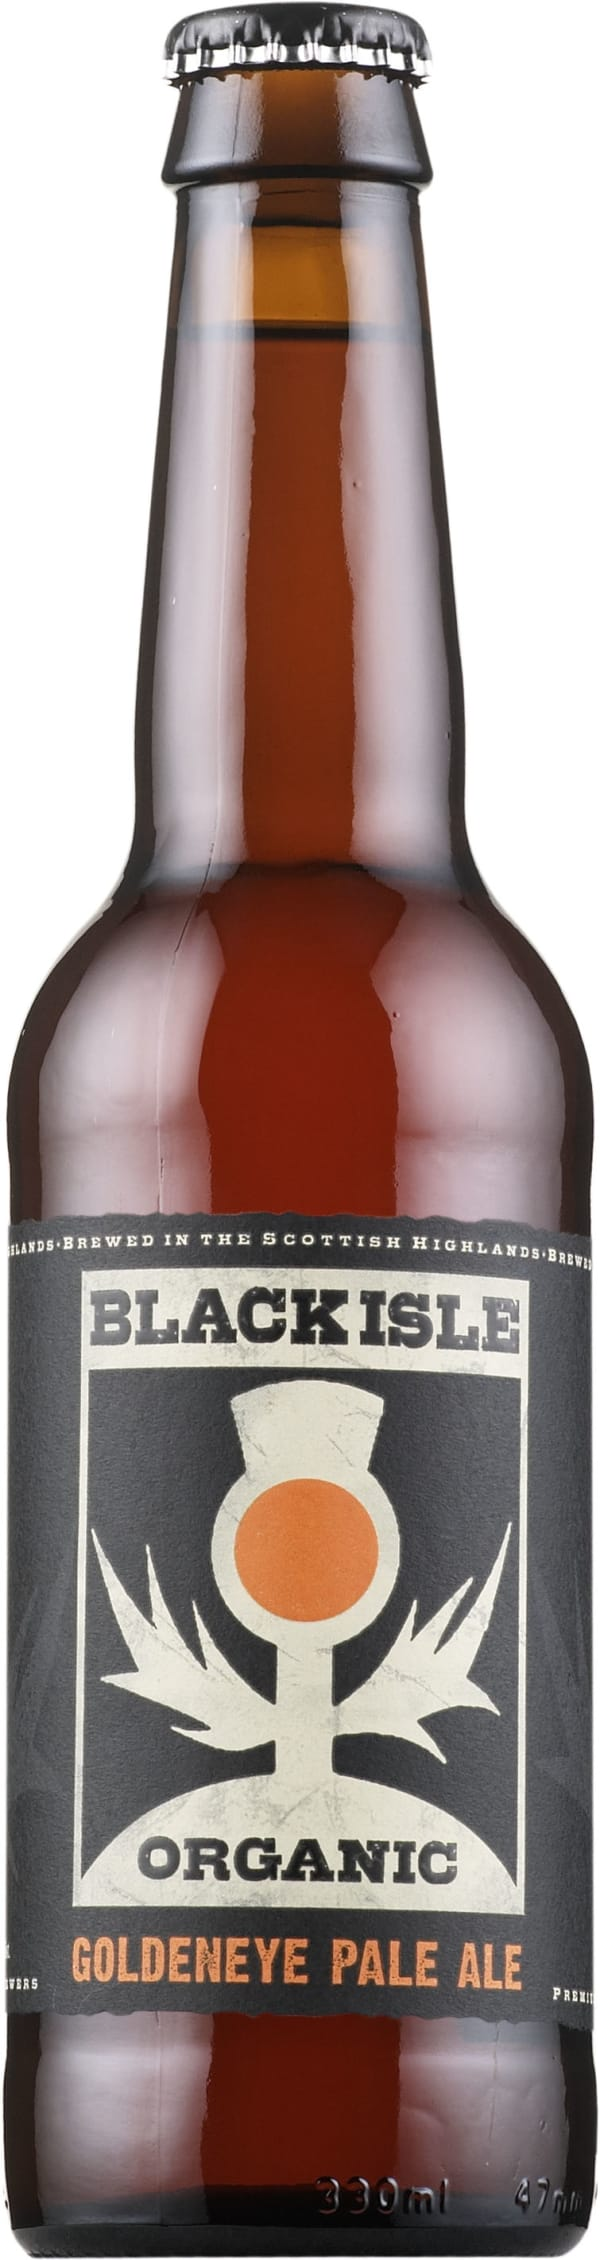 Black Isle Organic Goldeneye Pale Ale